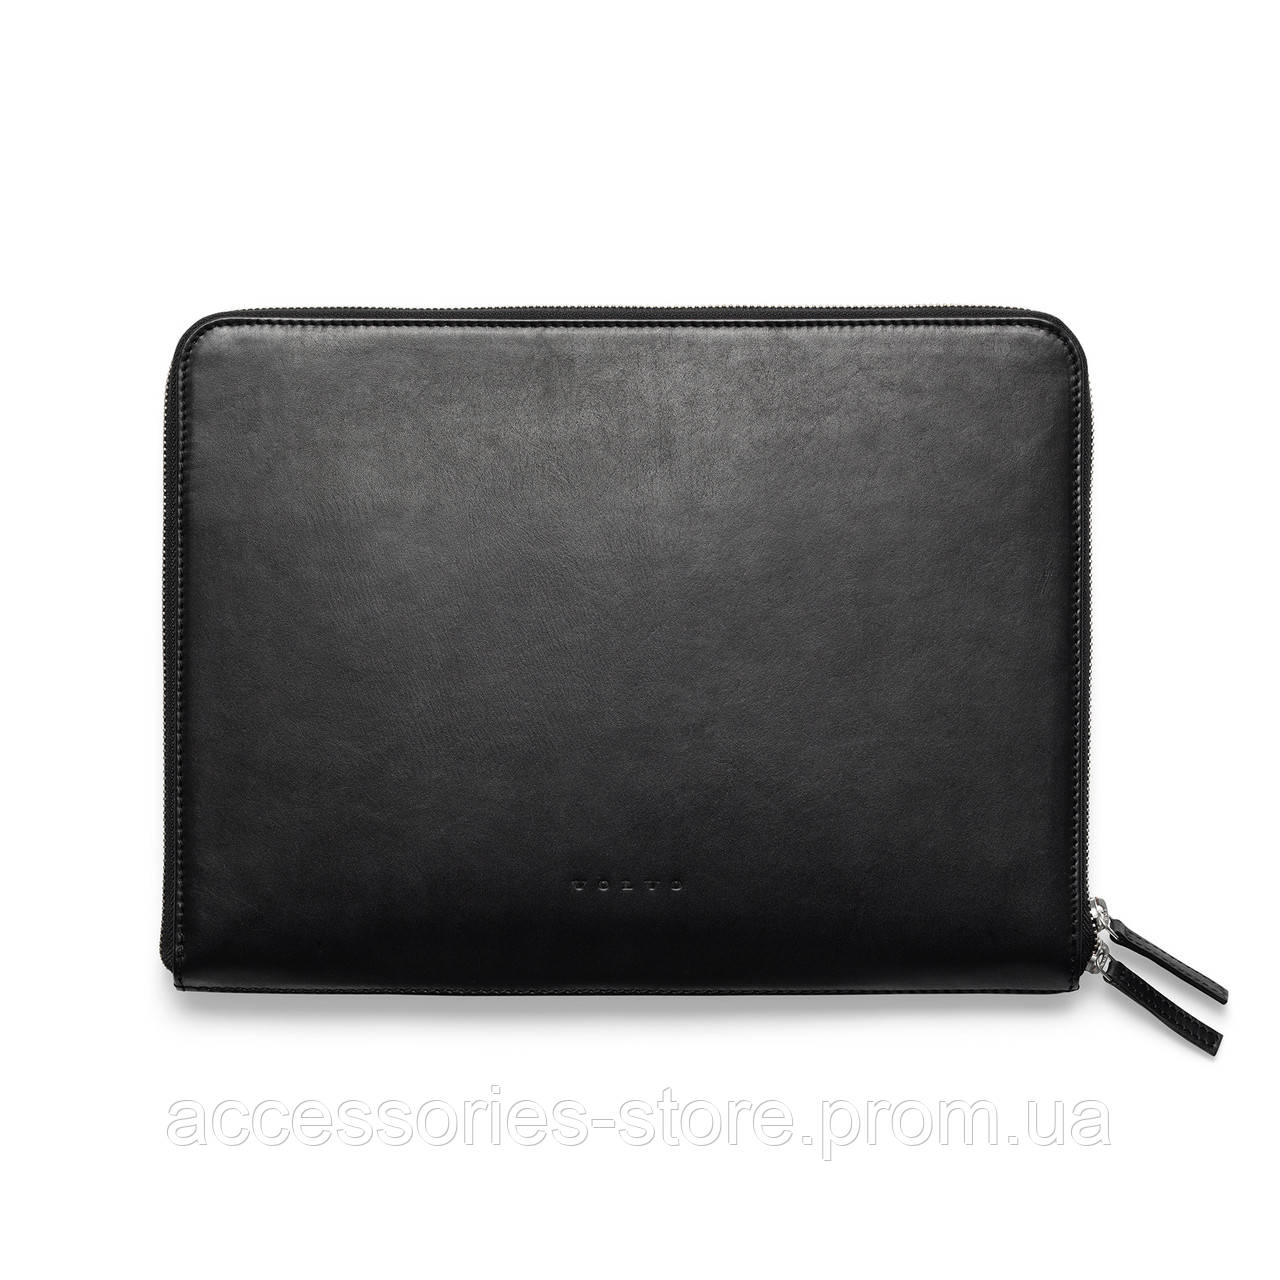 Кожаный чехол для ноутбука Volvo Leather Laptop Sleeve